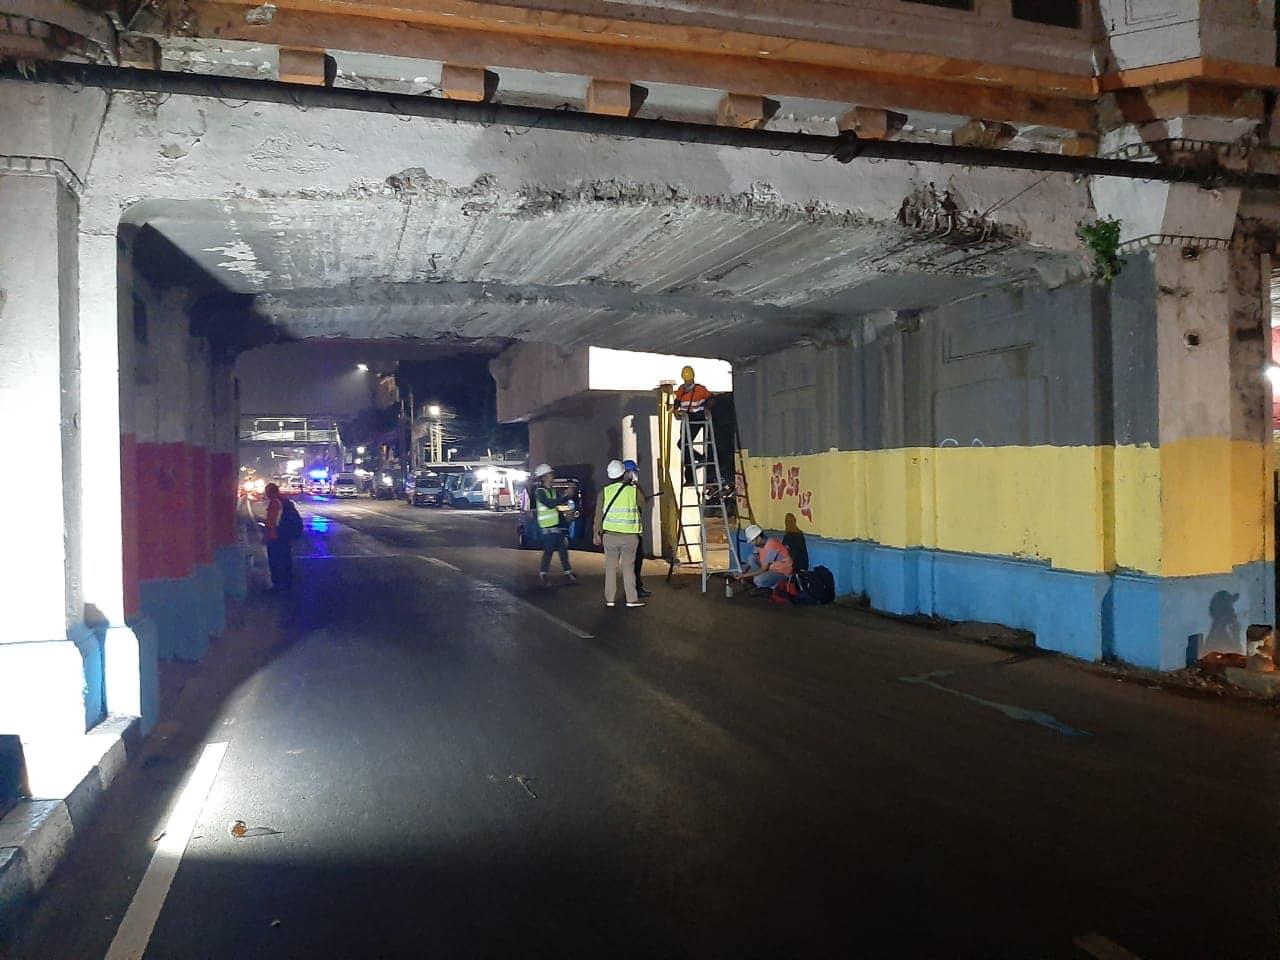 Audit Struktur Jembatan Kereta Api Matraman Jakarta